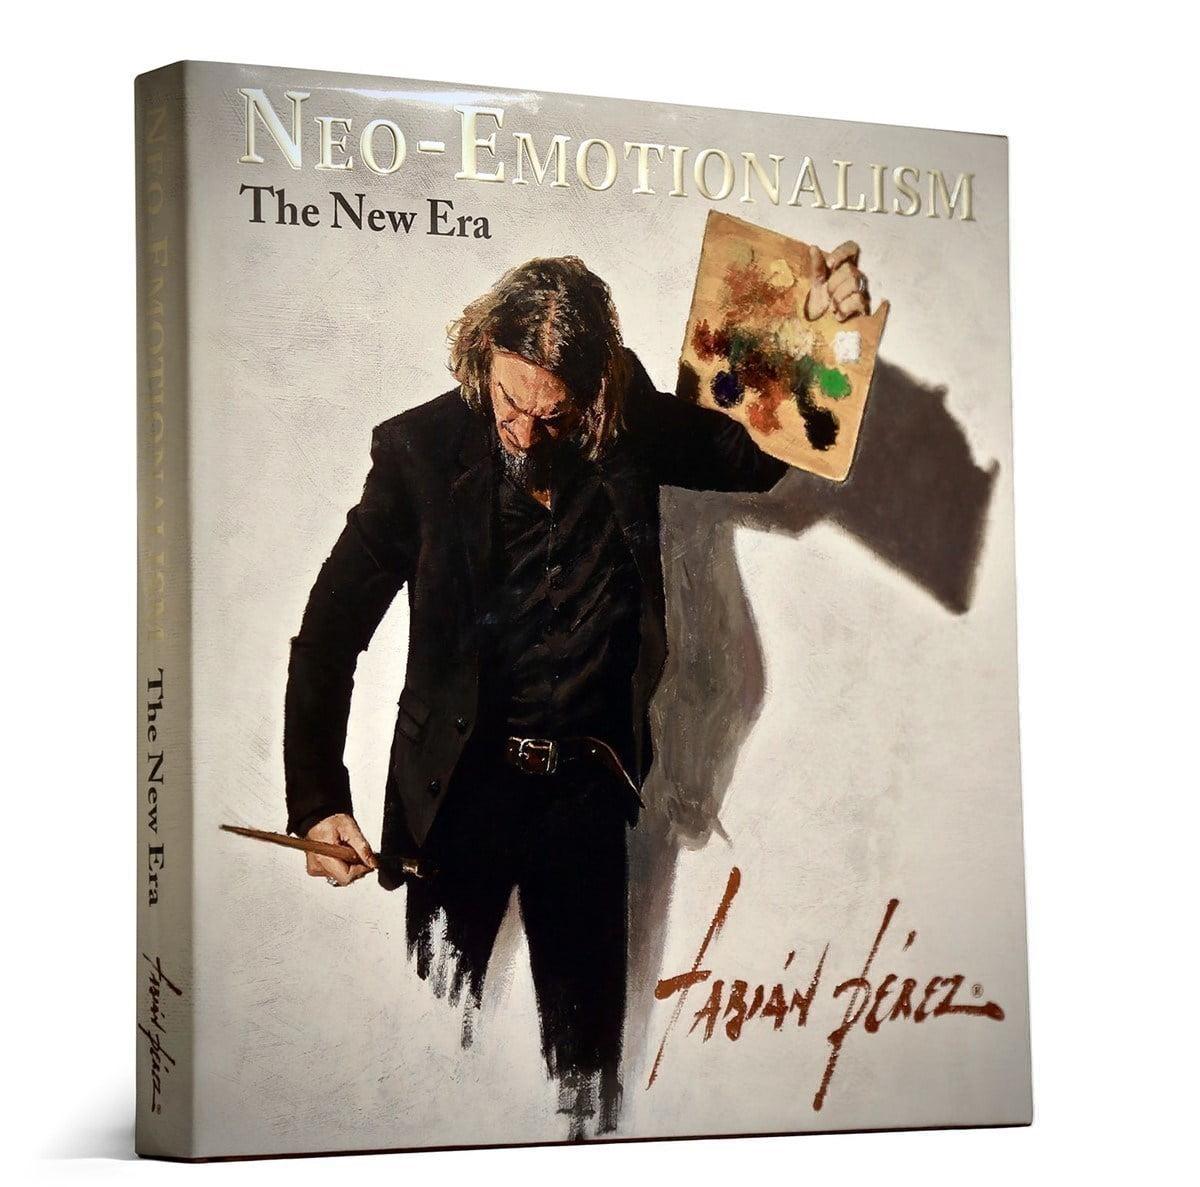 Neo Emotionalism New Era ~ Fabian Perez